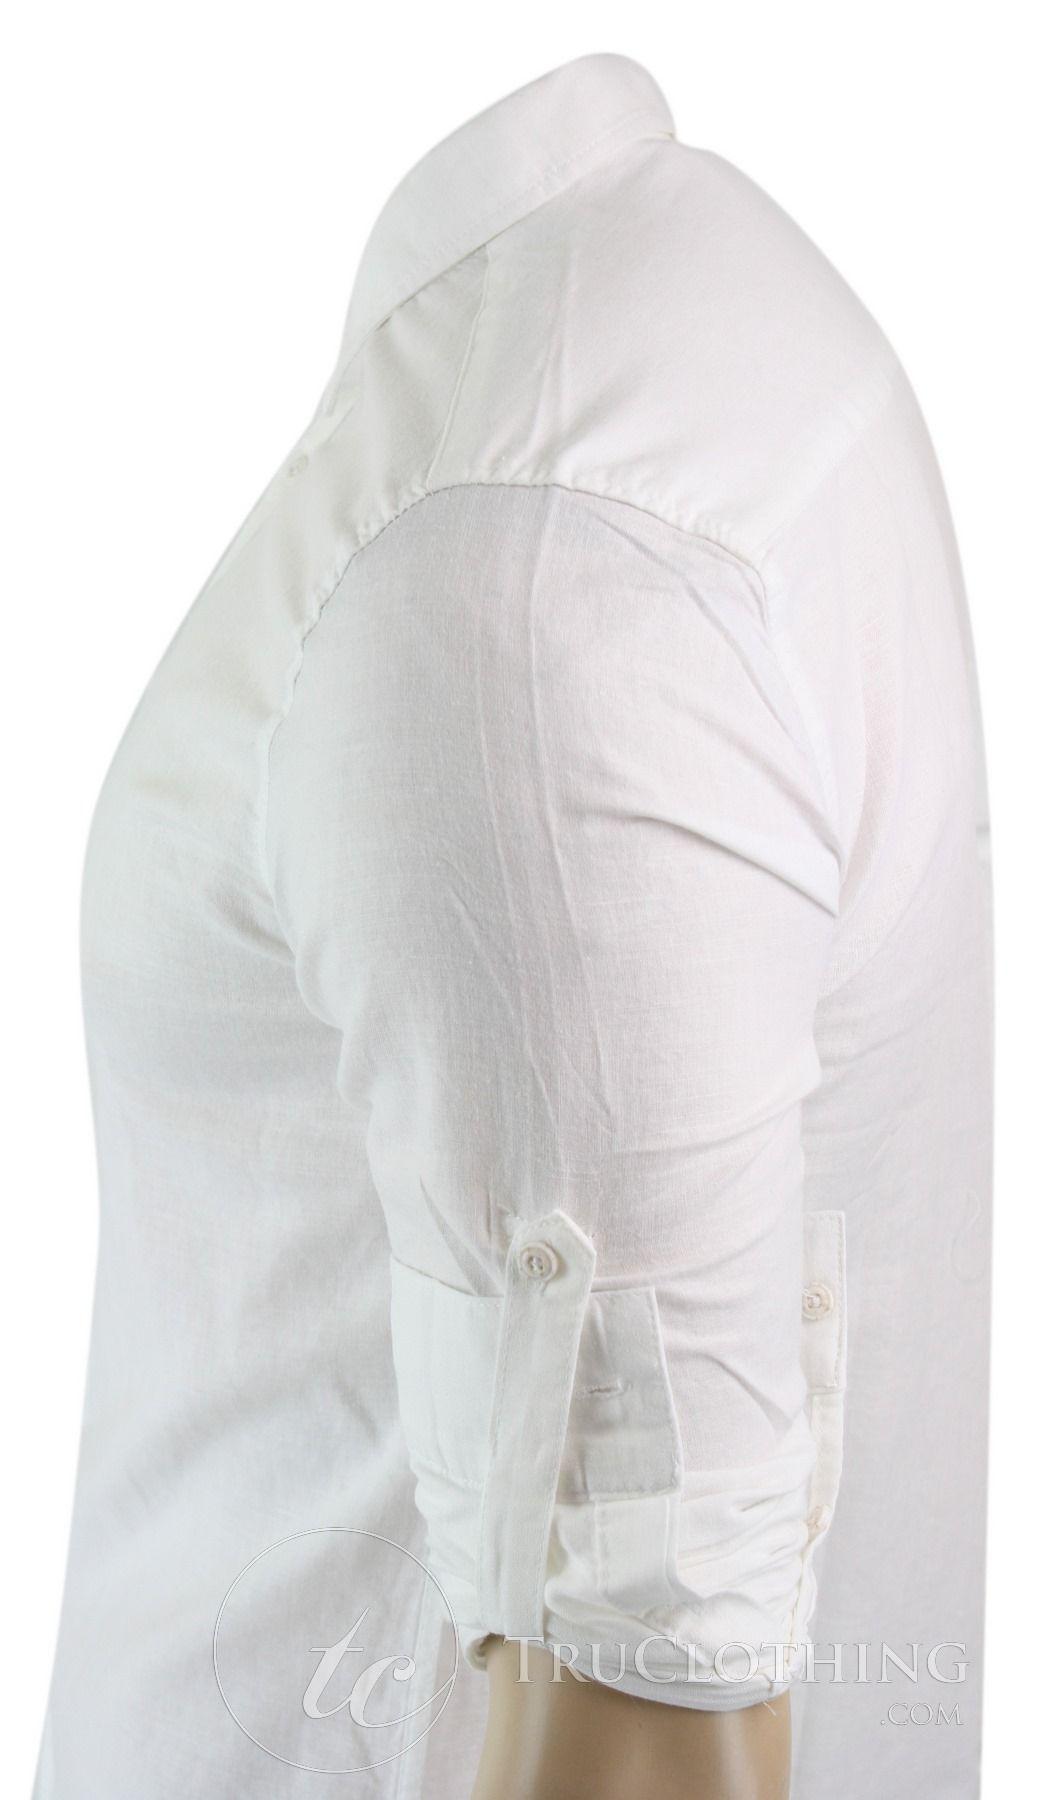 Mens Button Shirt Tie Cuff Link /& Hankie White Black Trim Silver Shiny Design